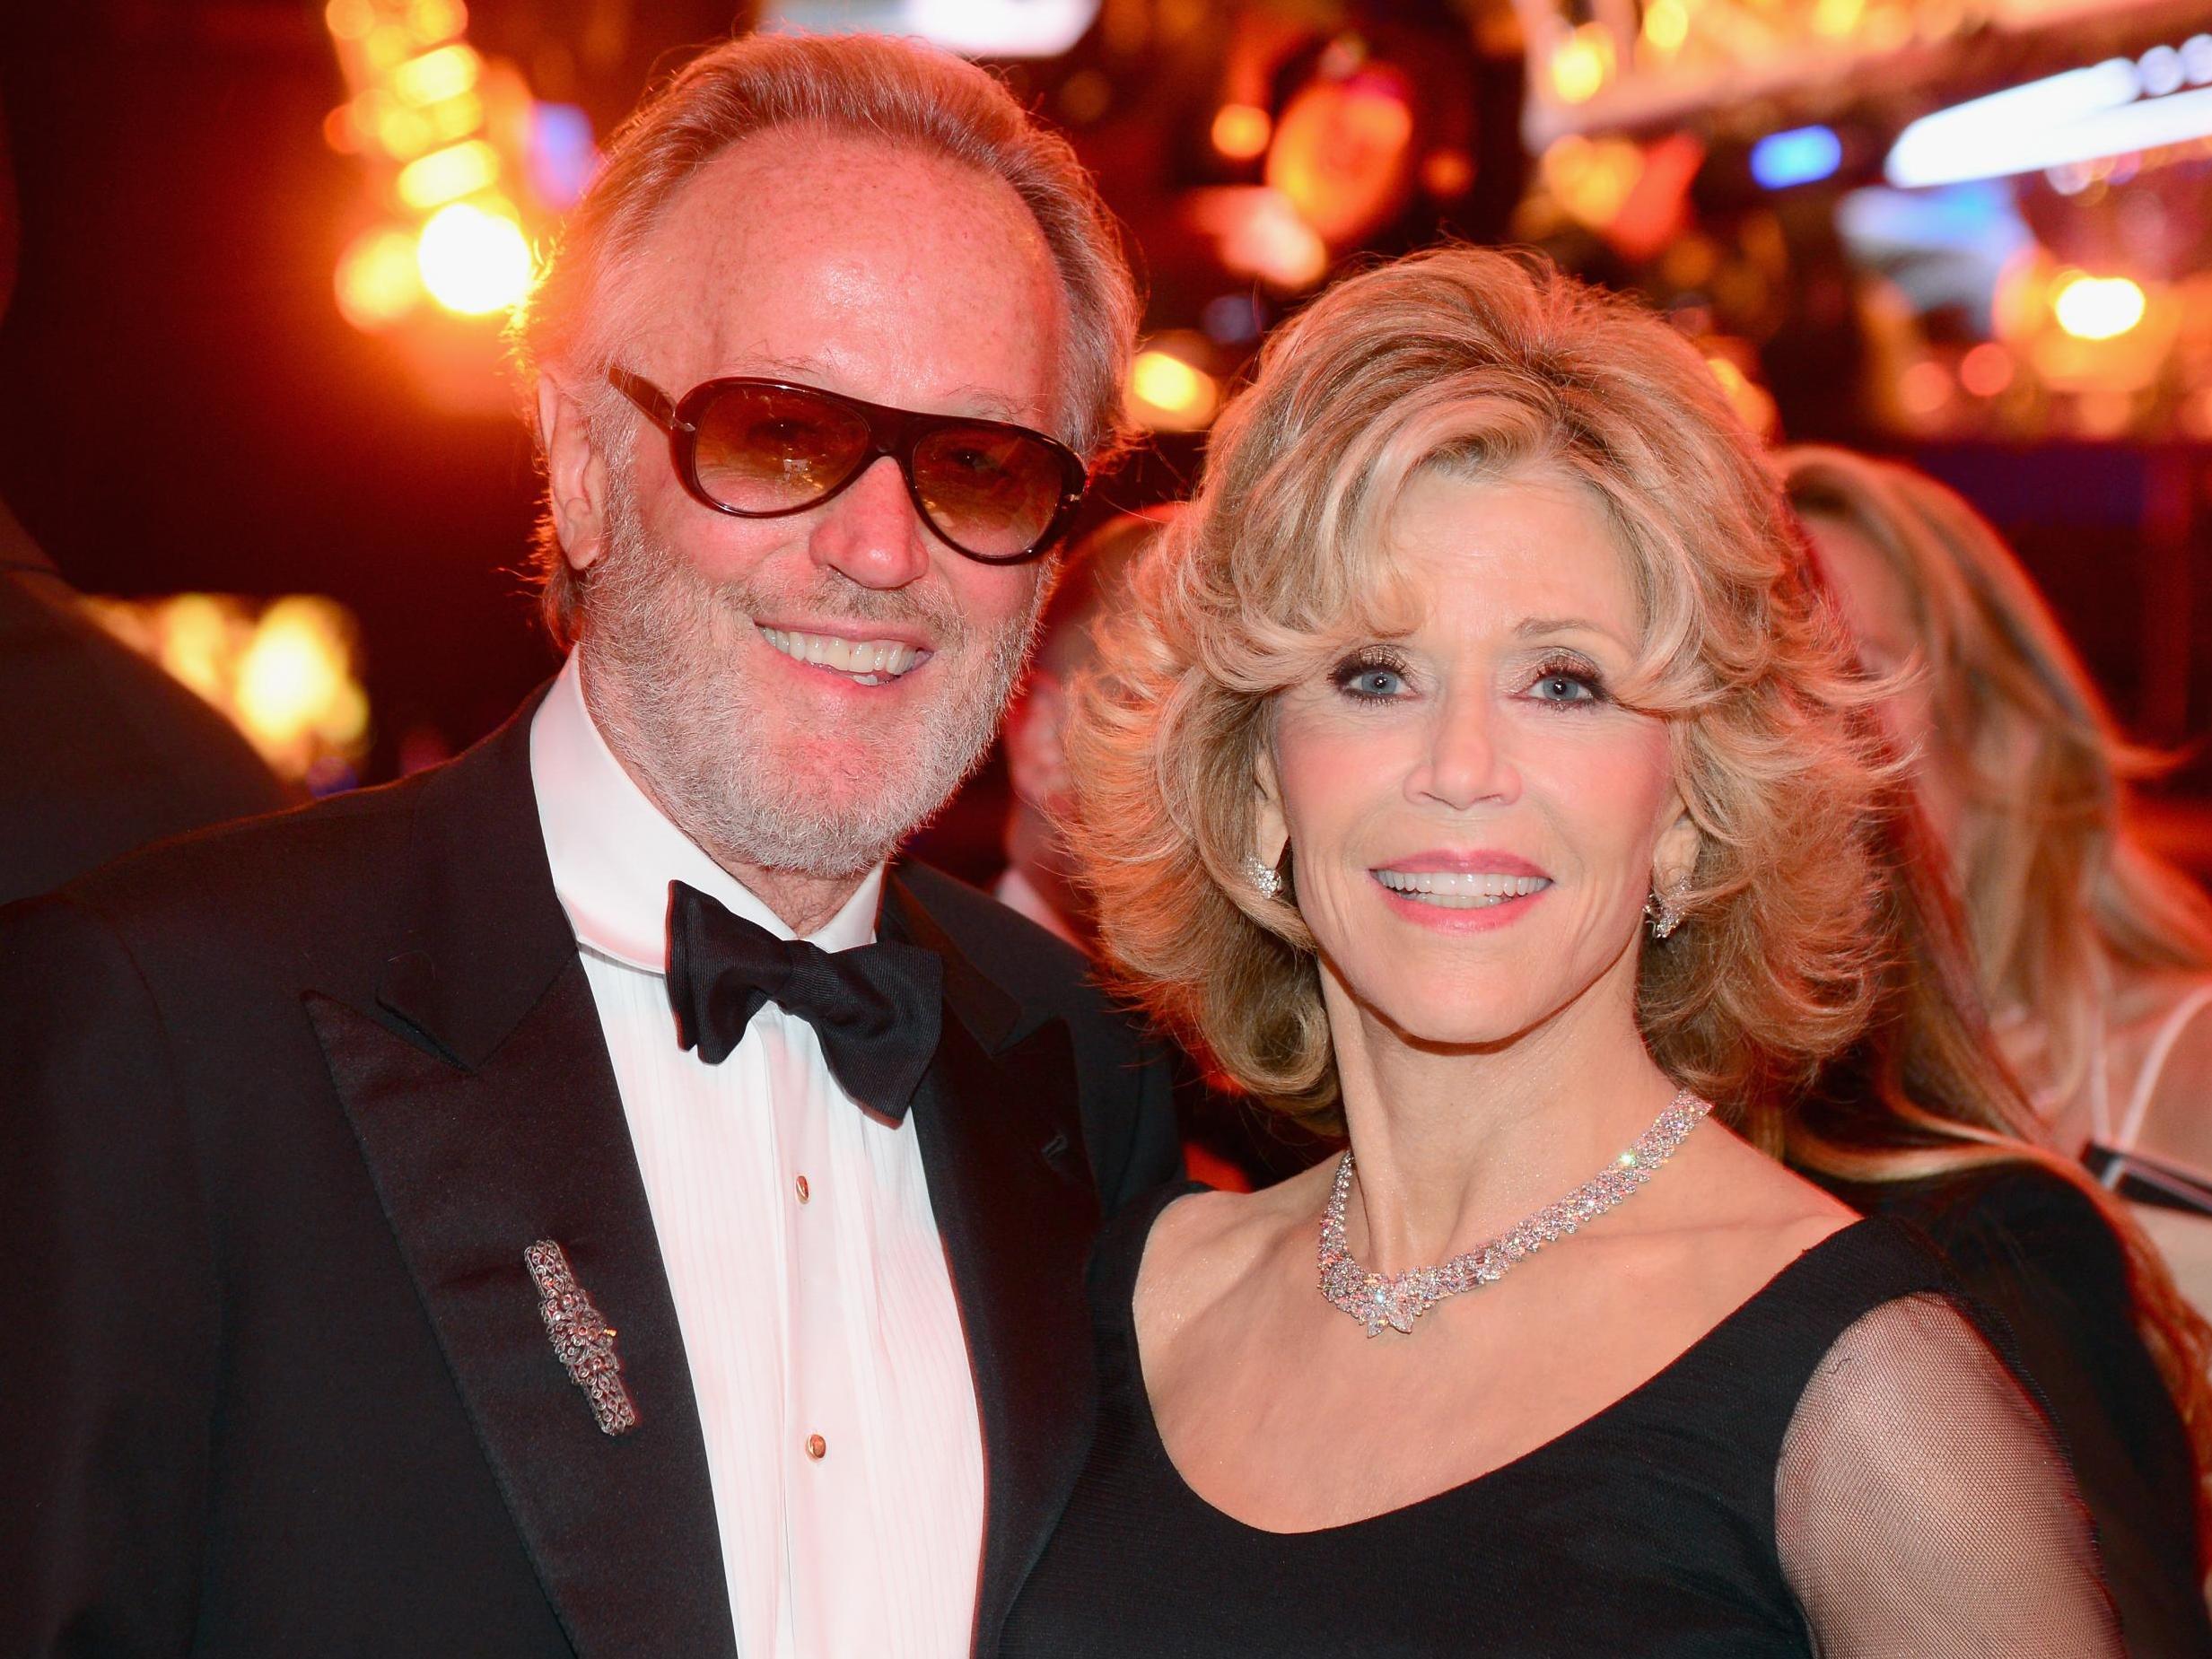 Peter Fonda dead: Jane Fonda leads tributes to Easy Rider star